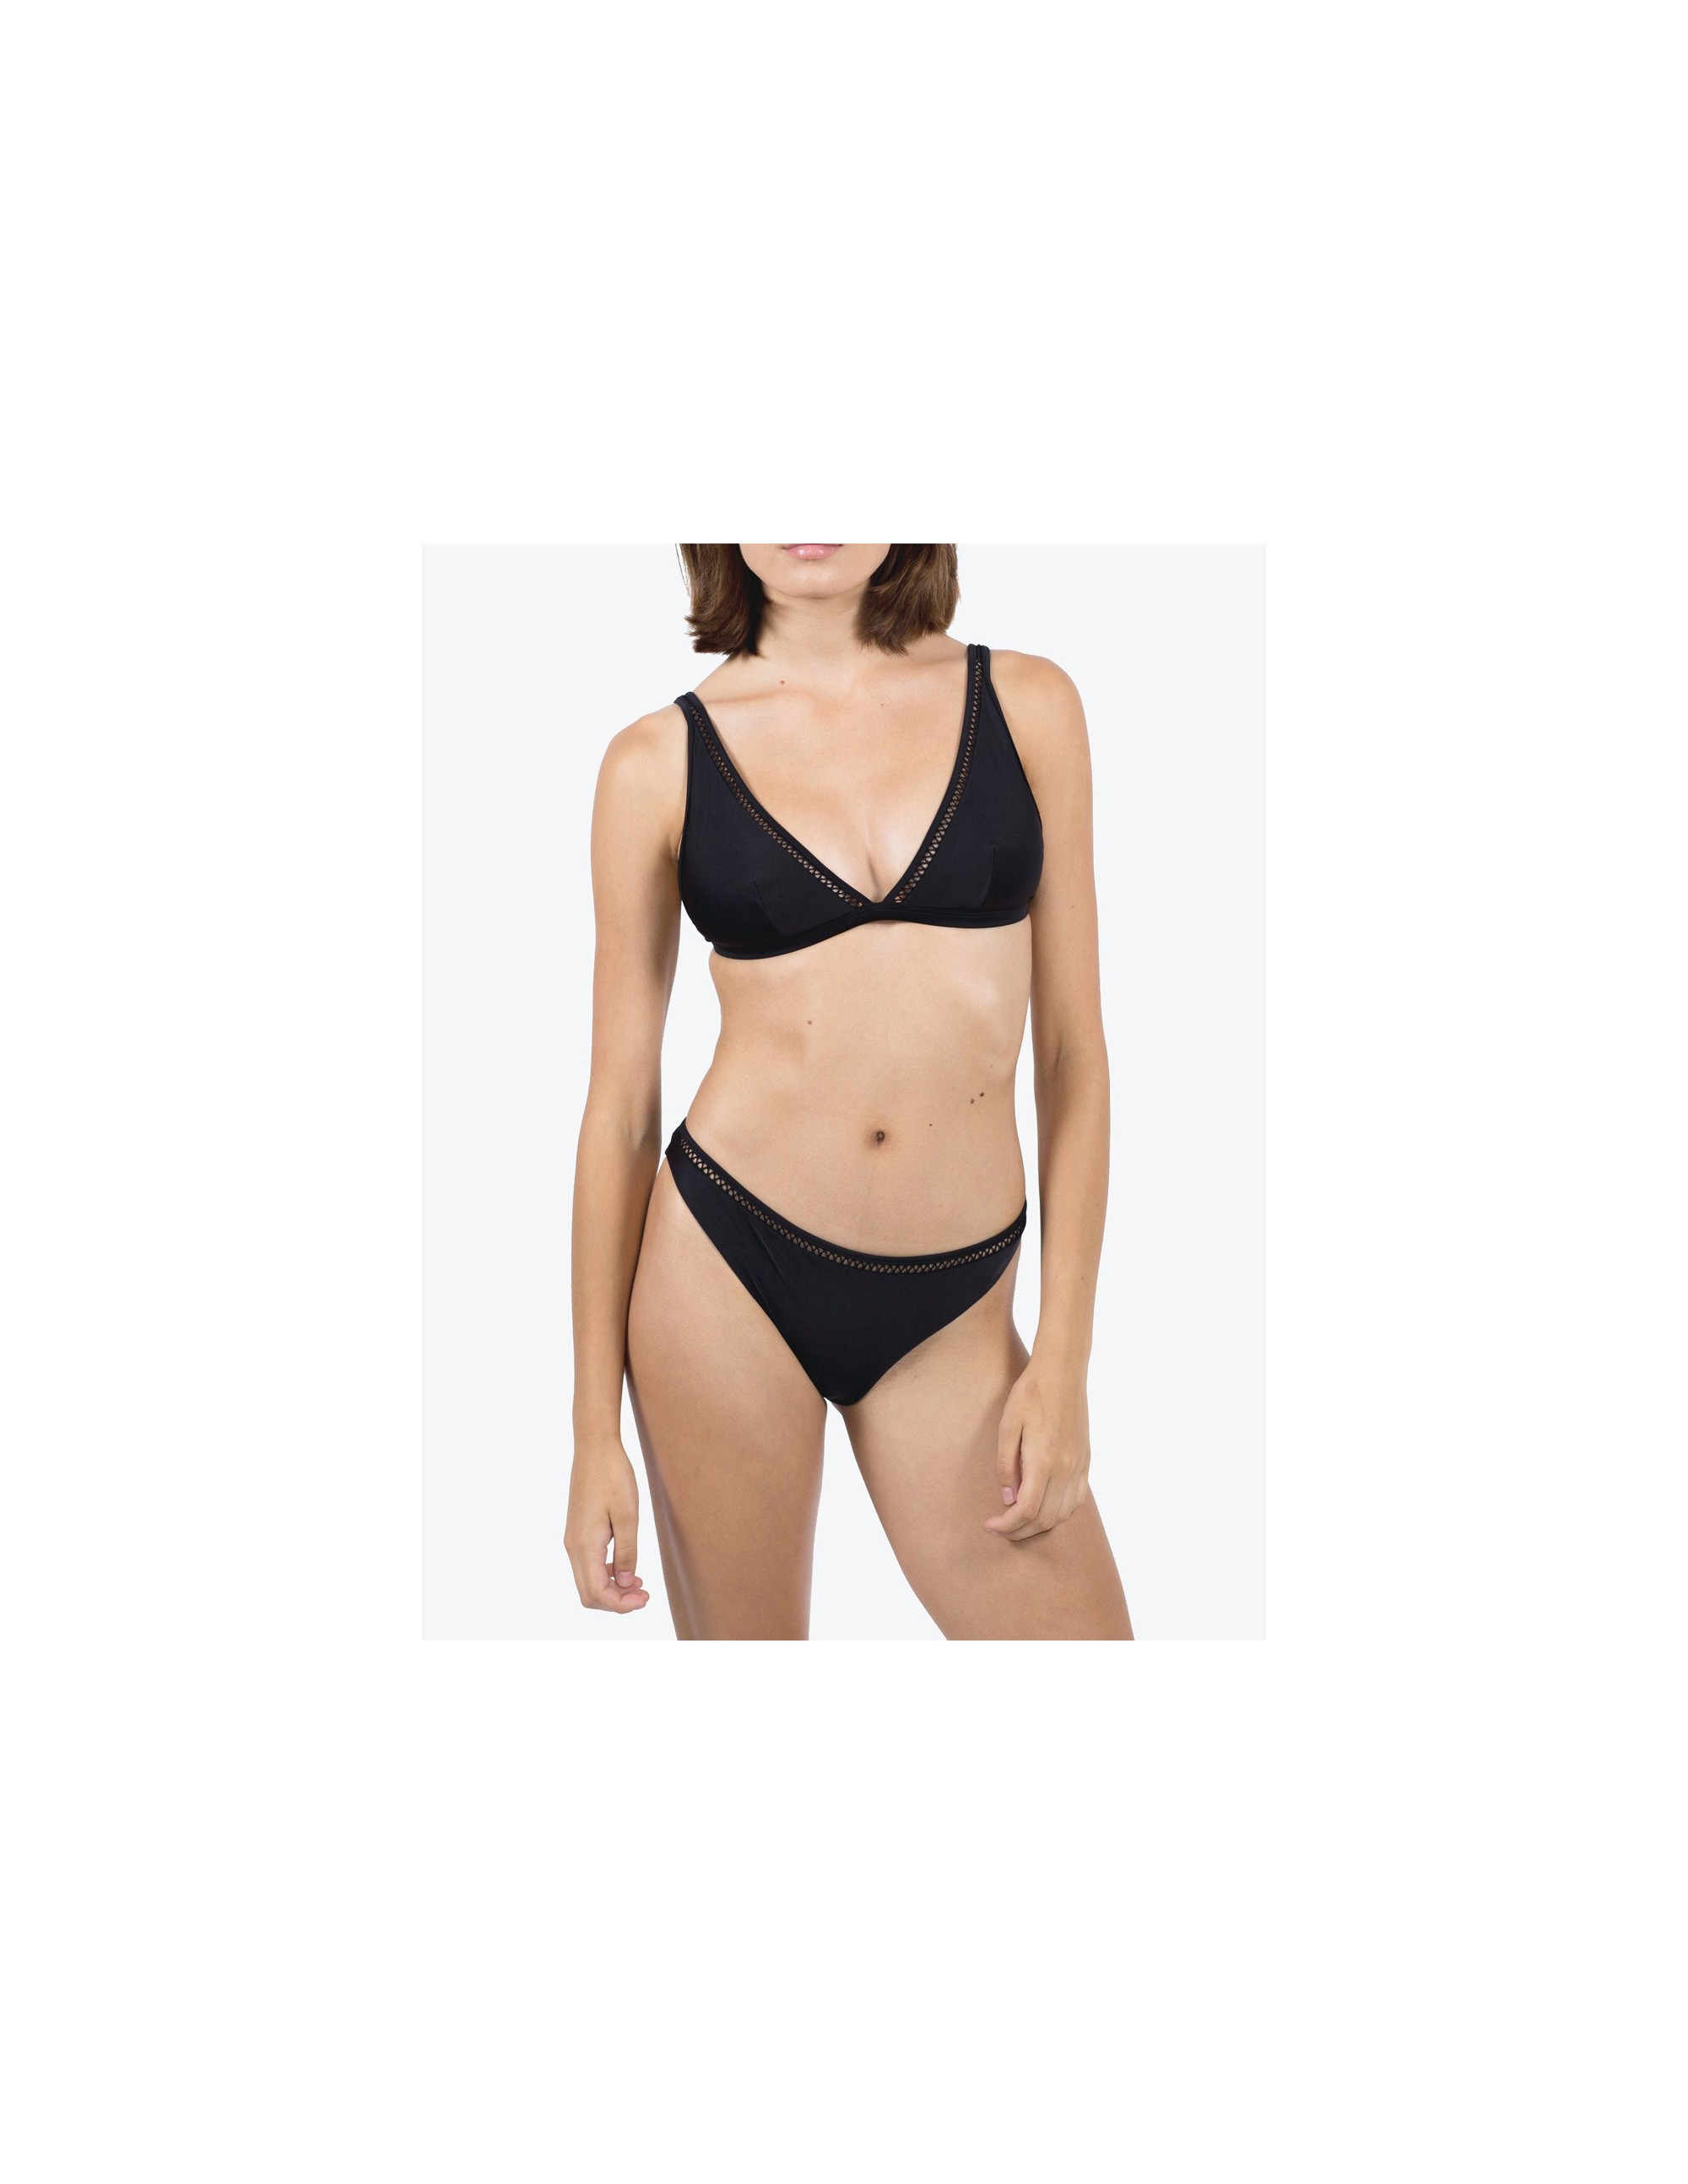 BELLA bikini top - MATTE BLACK